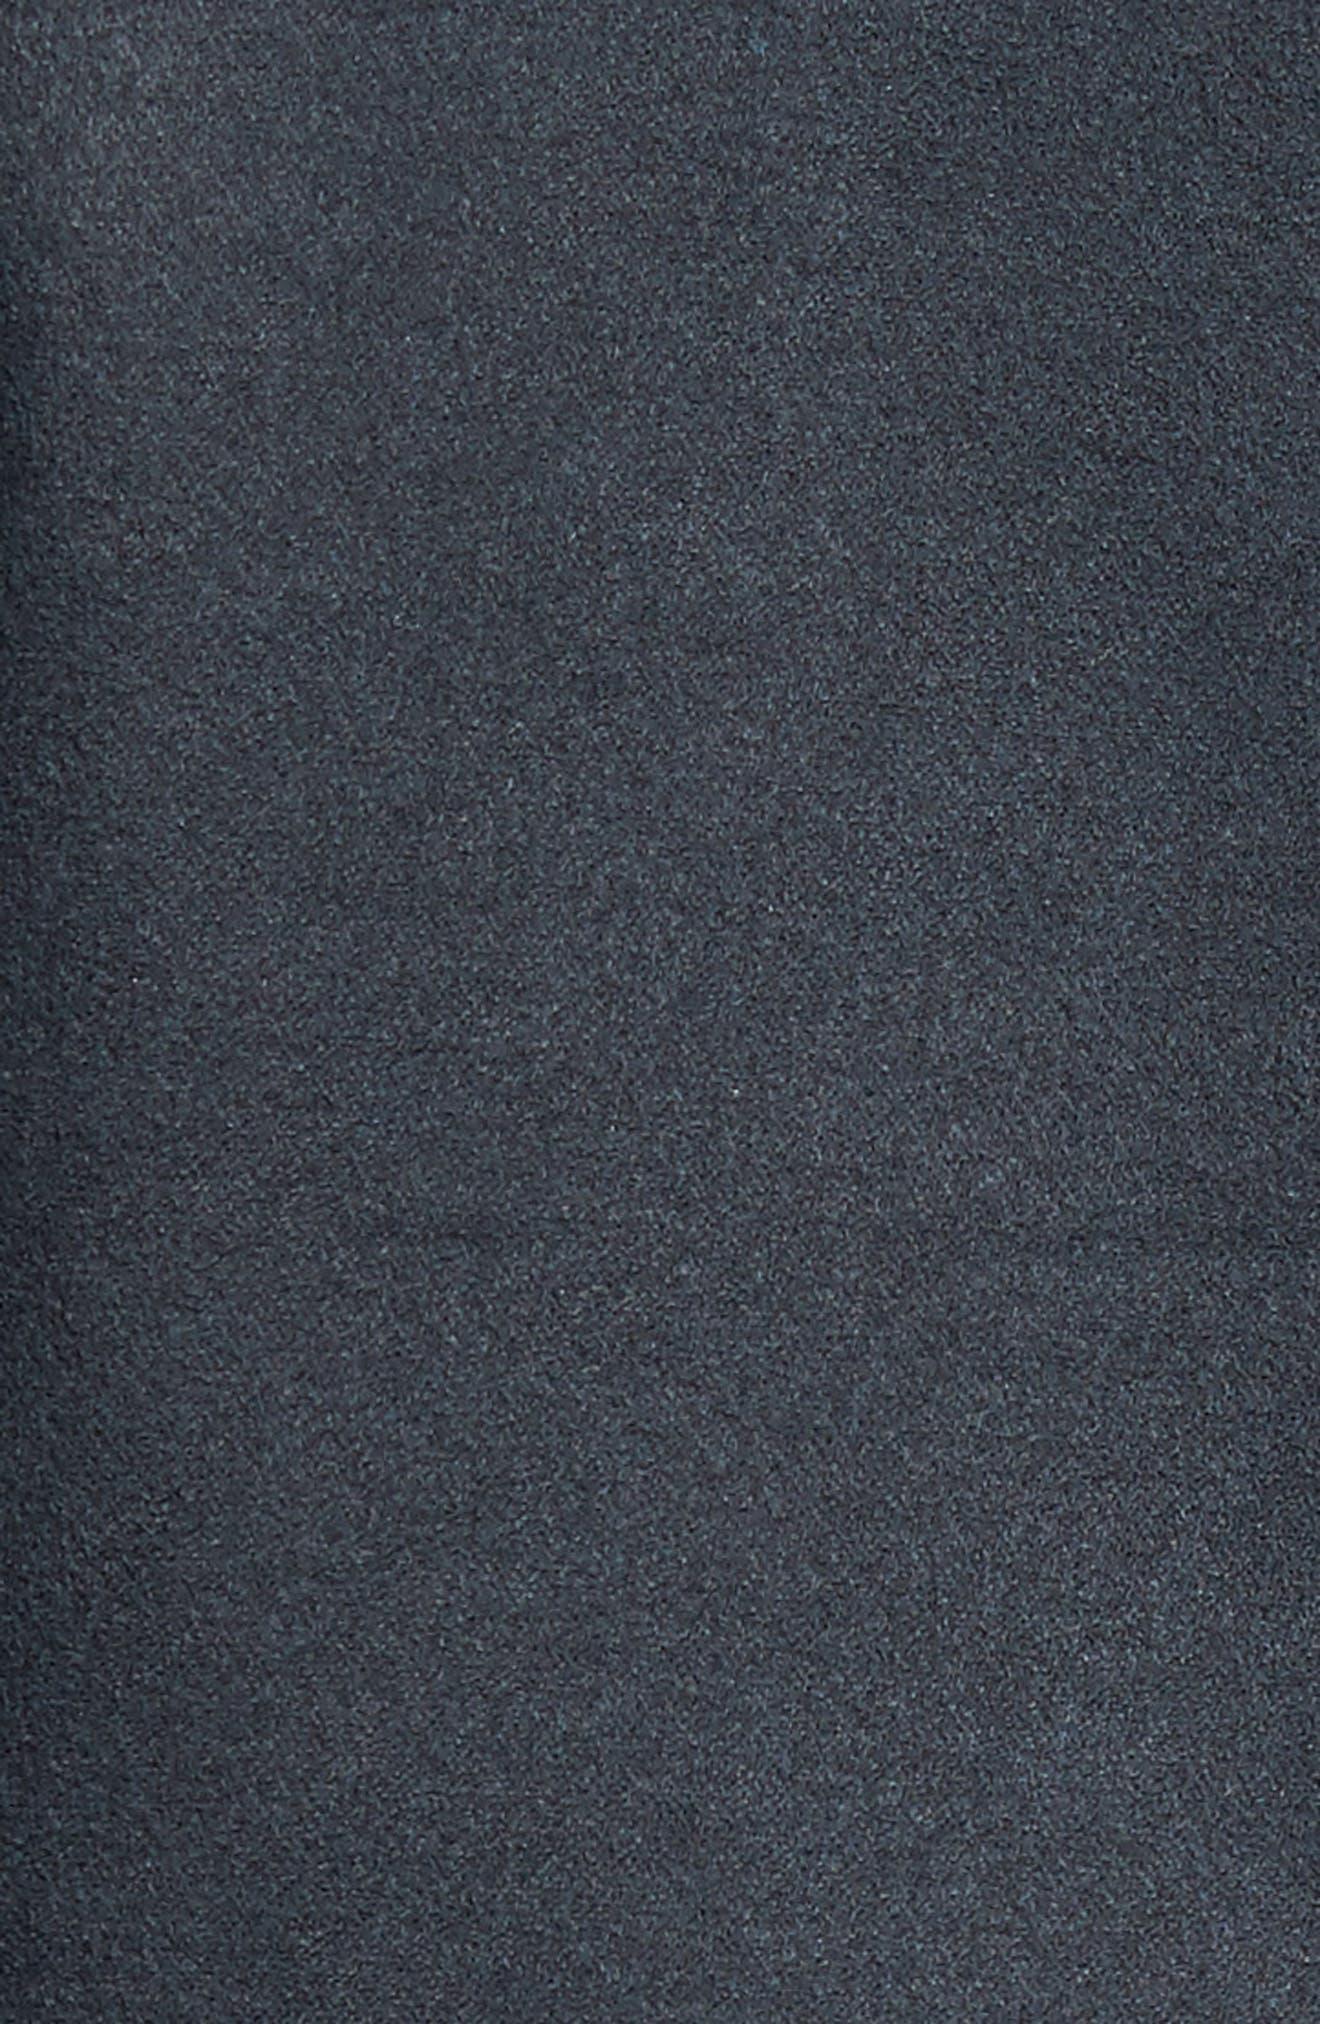 'Colt' Regular Fit Sueded Cotton Blend Shirt Jacket,                             Alternate thumbnail 5, color,                             INKWELL